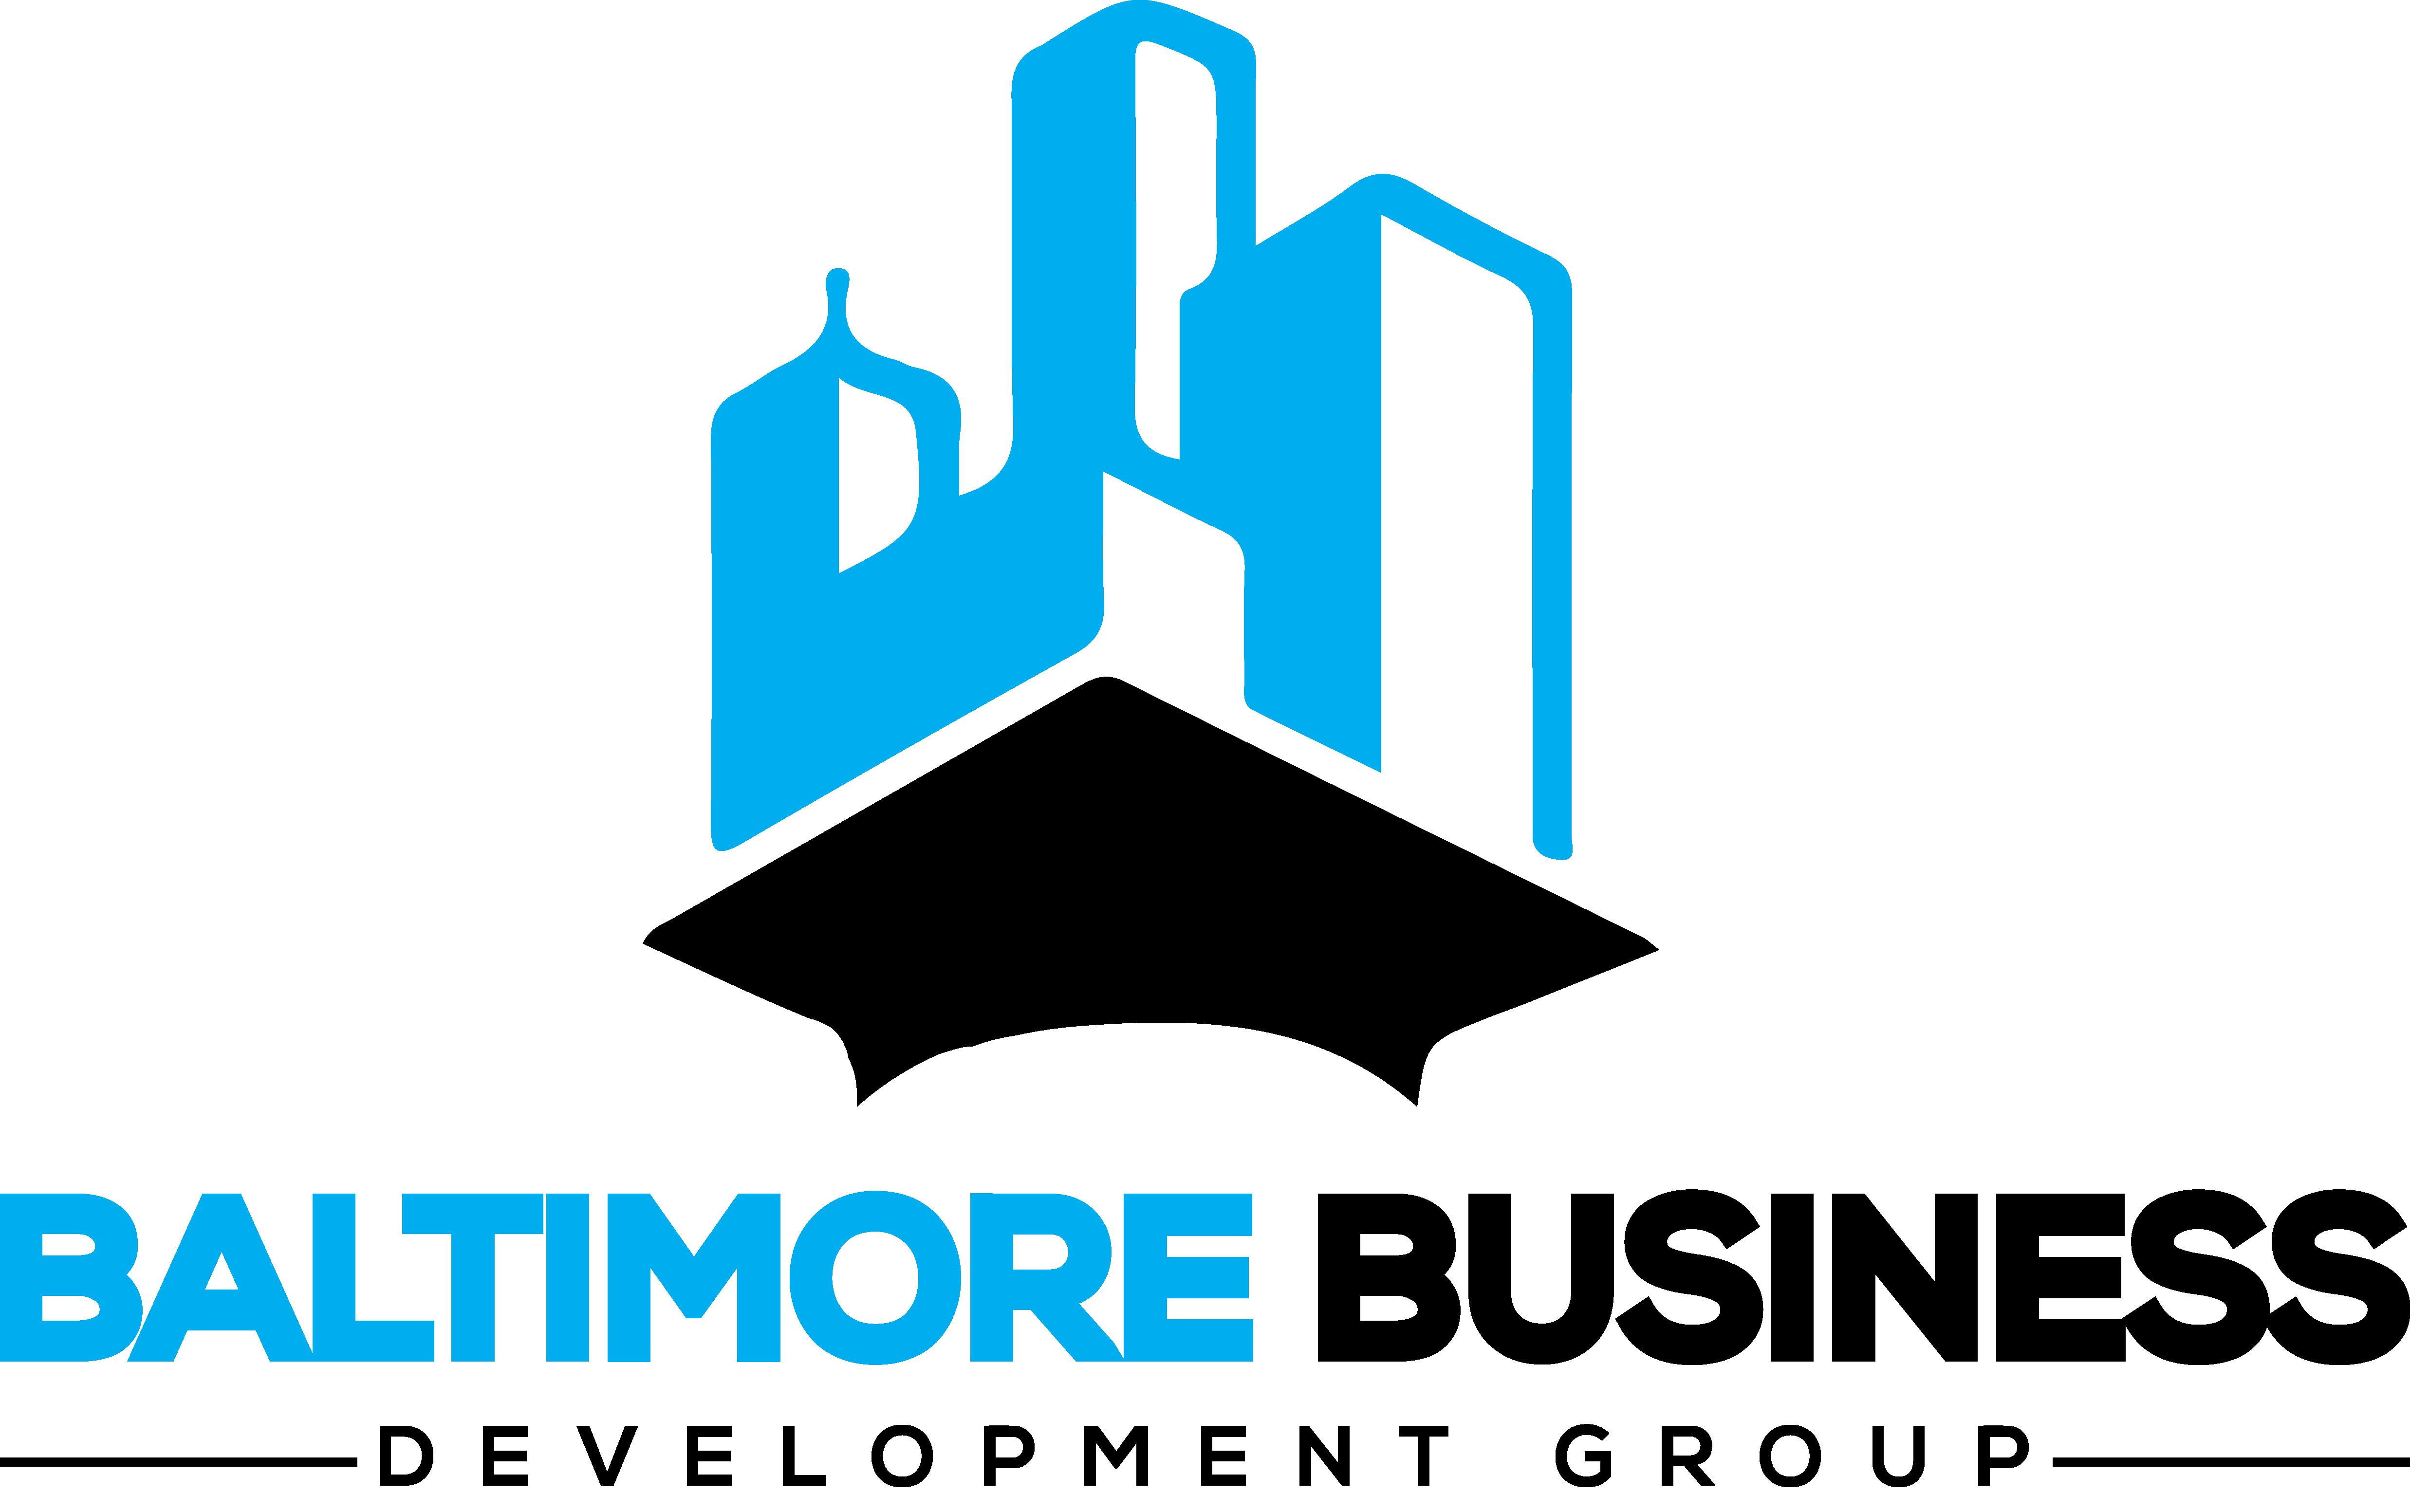 Baltimore Business Development Group